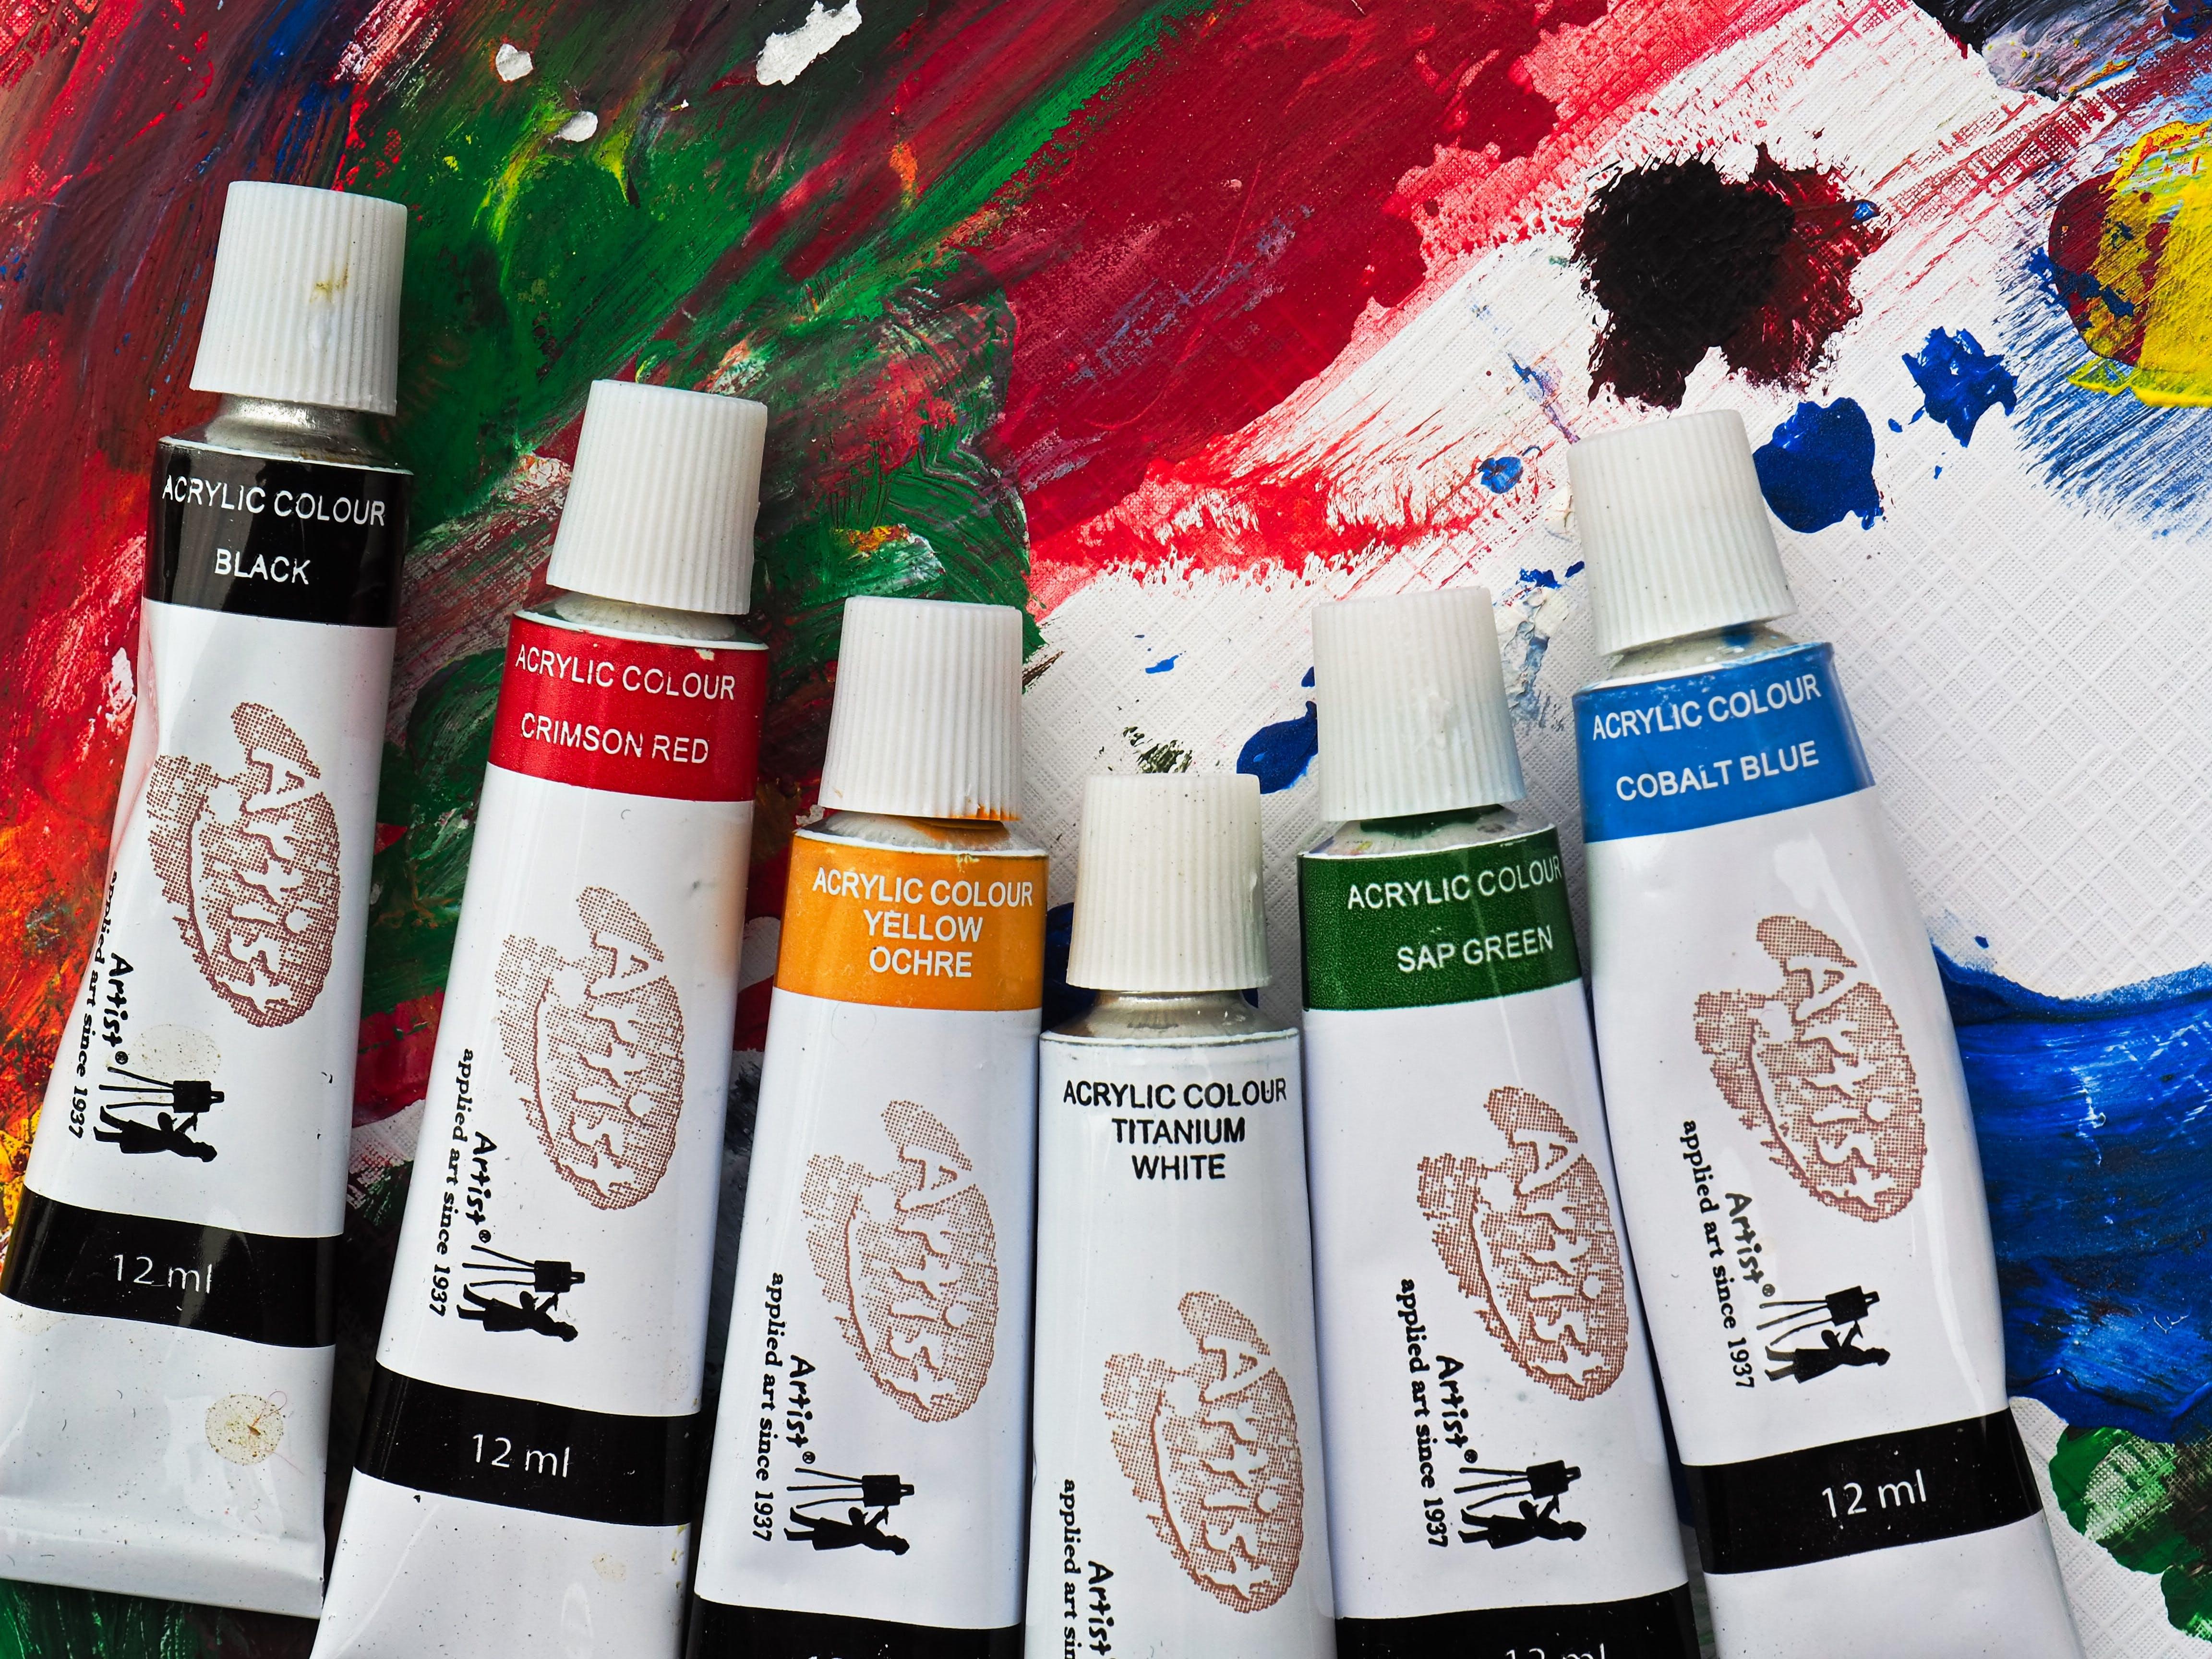 Assorted-color Artist Color Soft-tubes